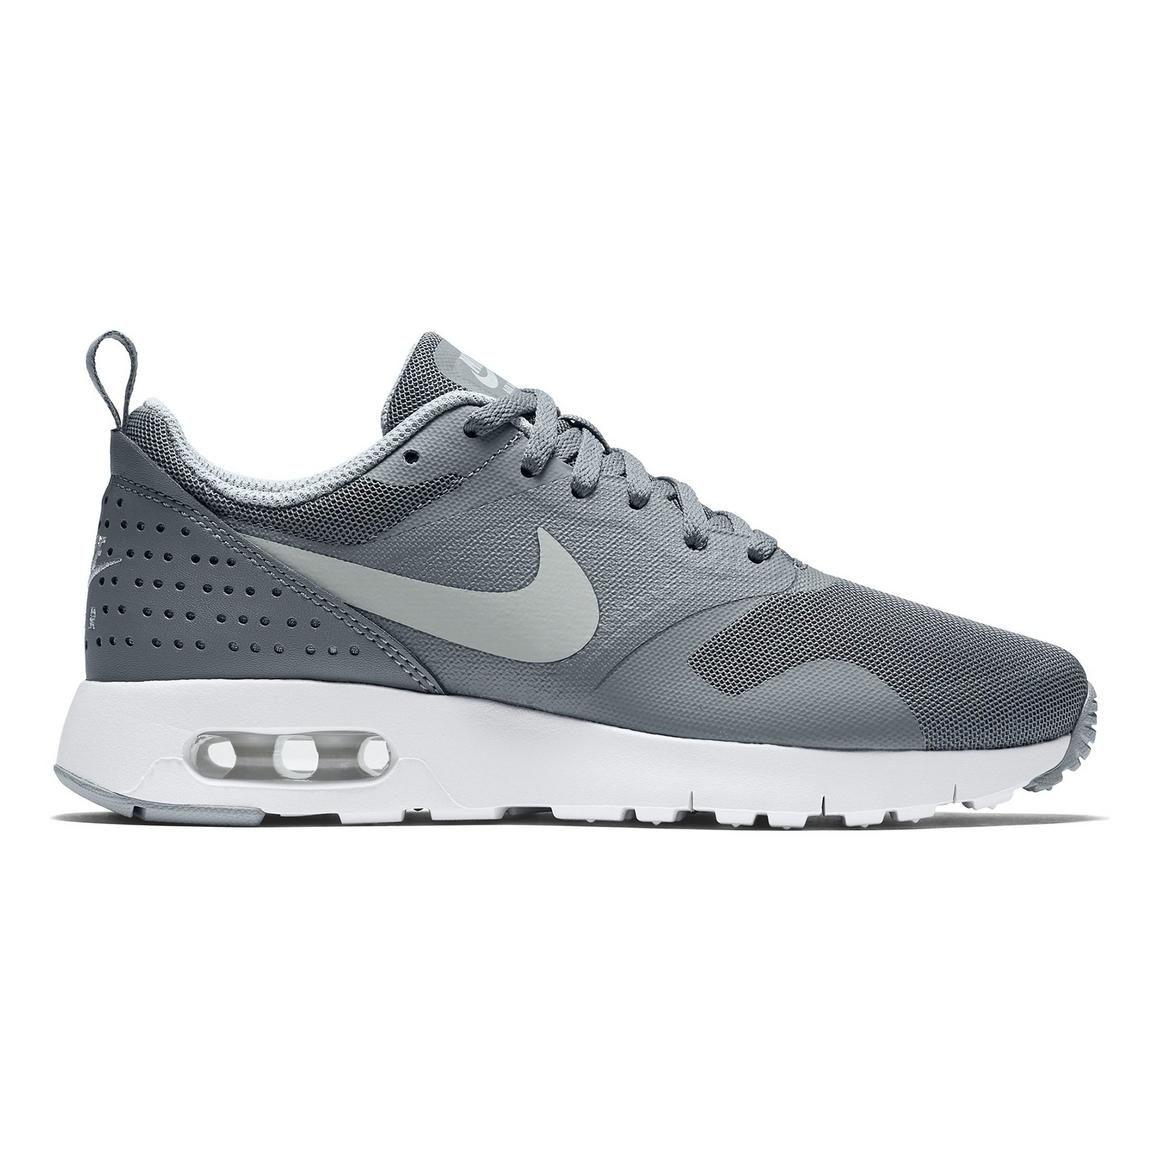 "Nike Air Max Tavas ""Grey/White"" Grade School Boys' Casual"